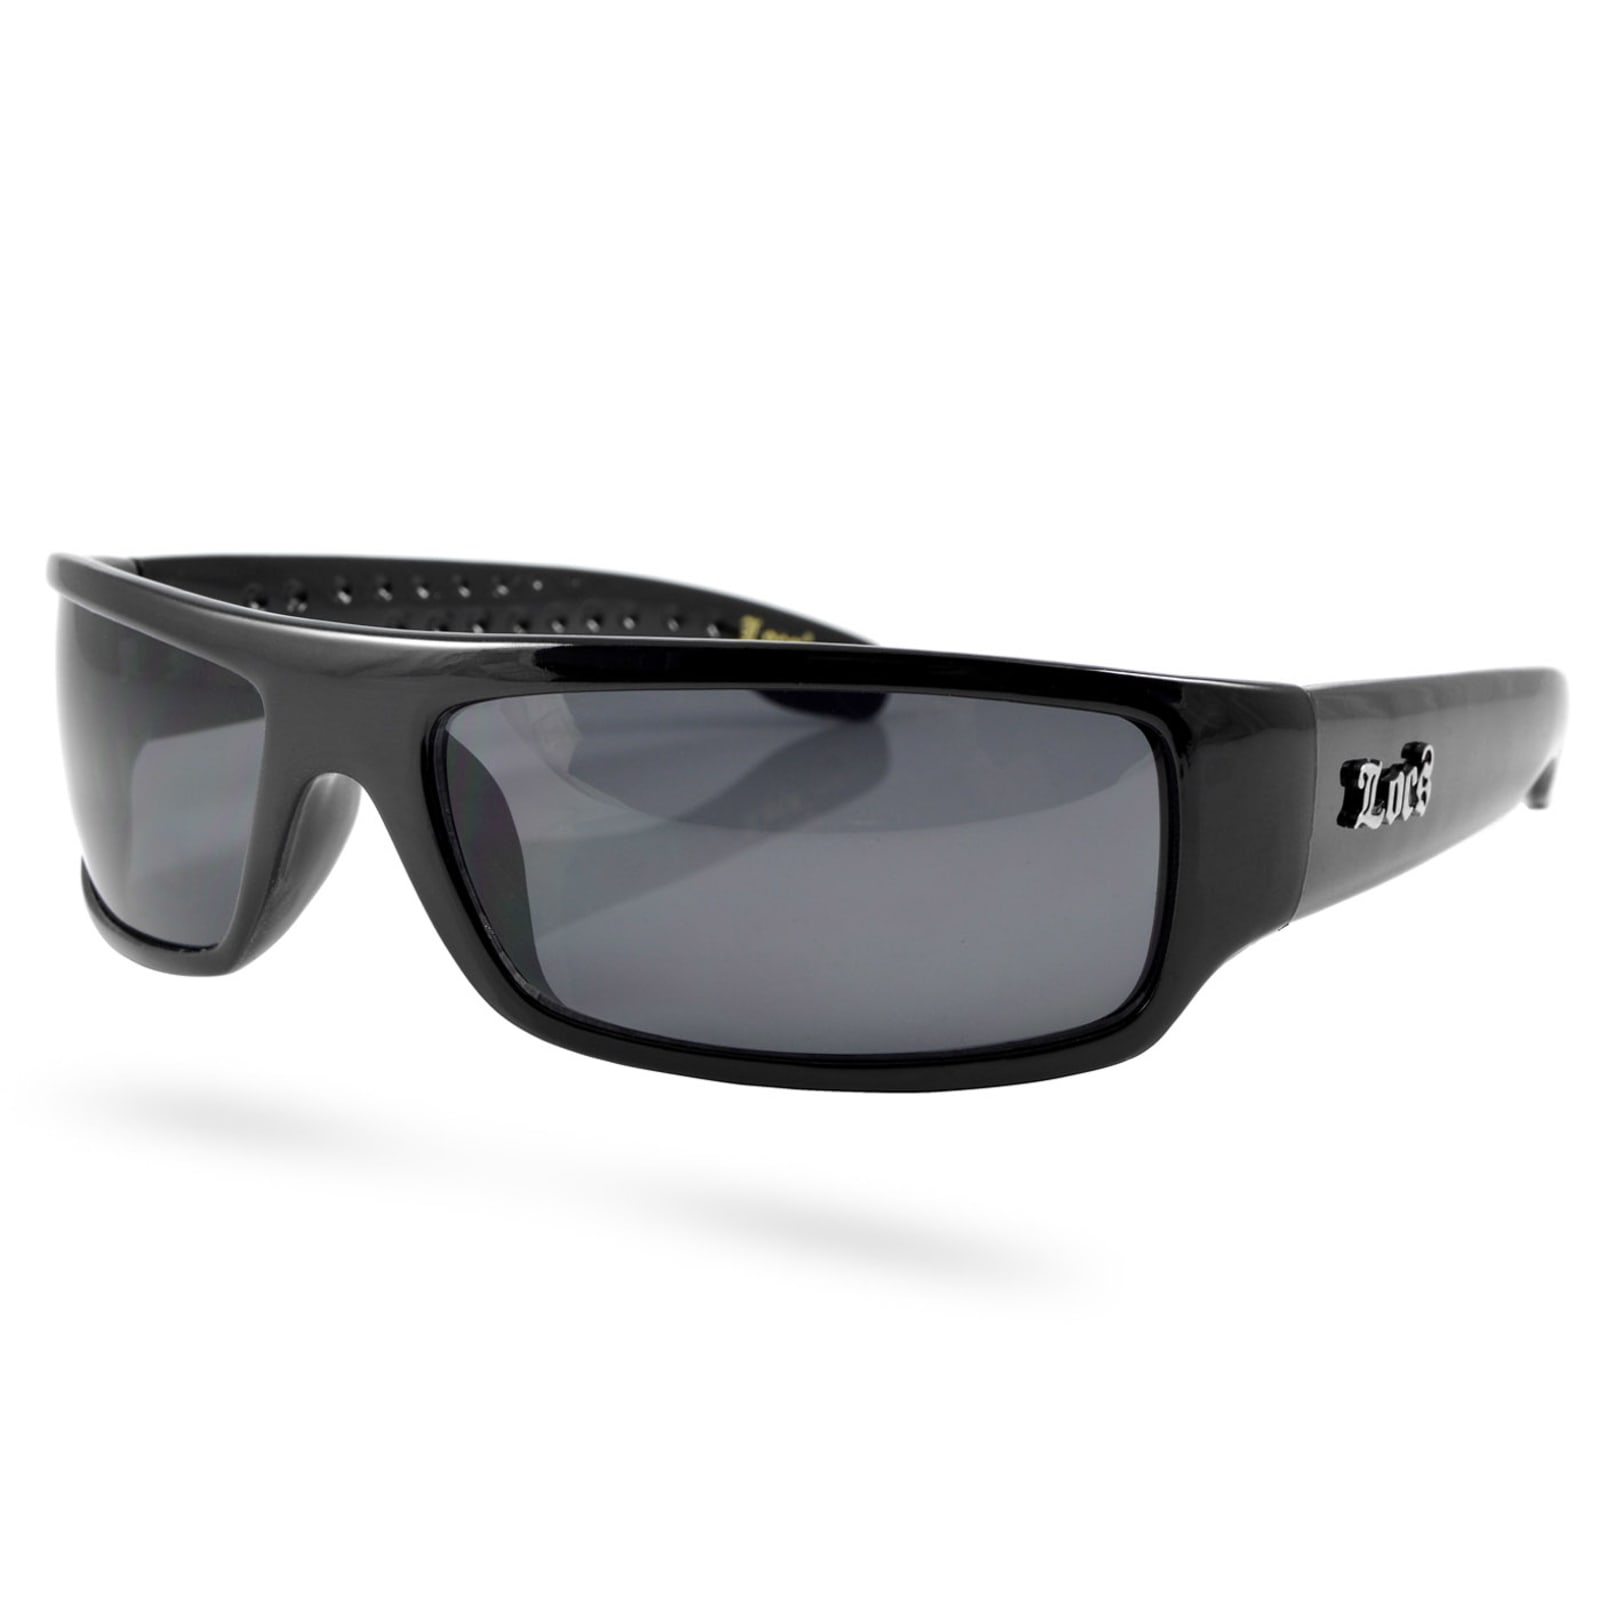 2d6055d66f1 Κλασικά Γυαλιά Ηλίου Biker Locs